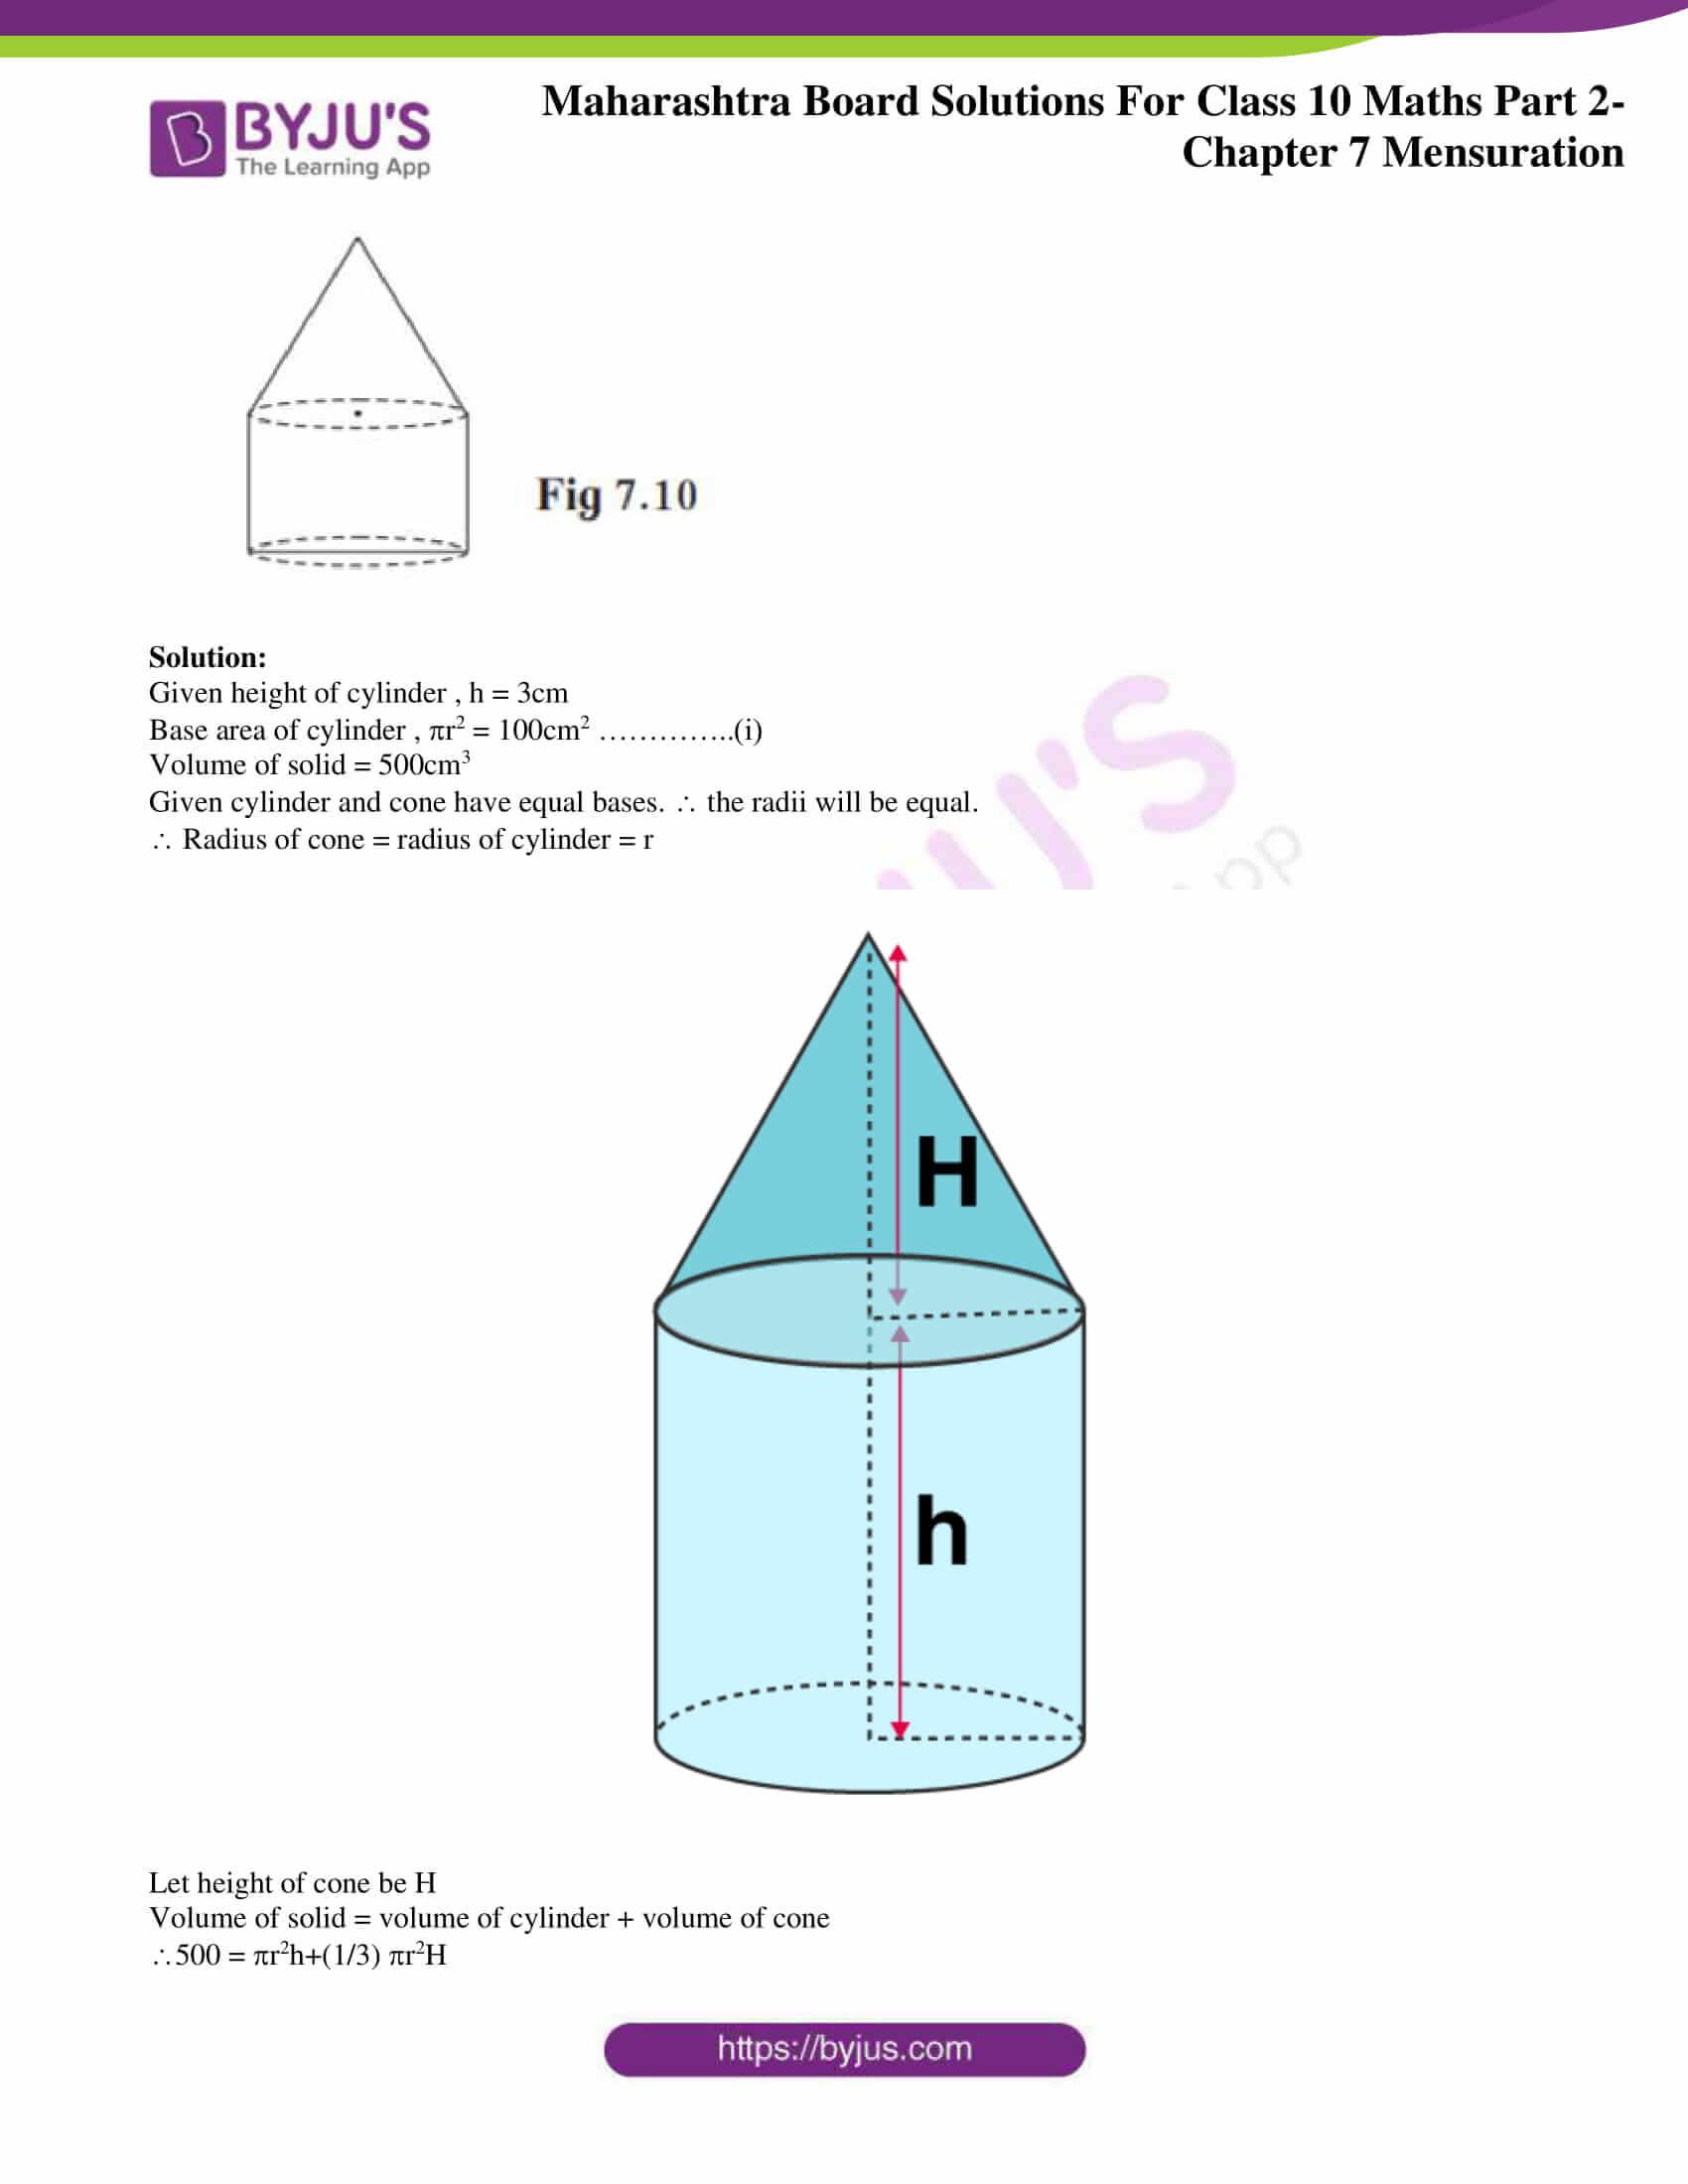 msbshse sol class 10 maths part 2 chapter 7 03